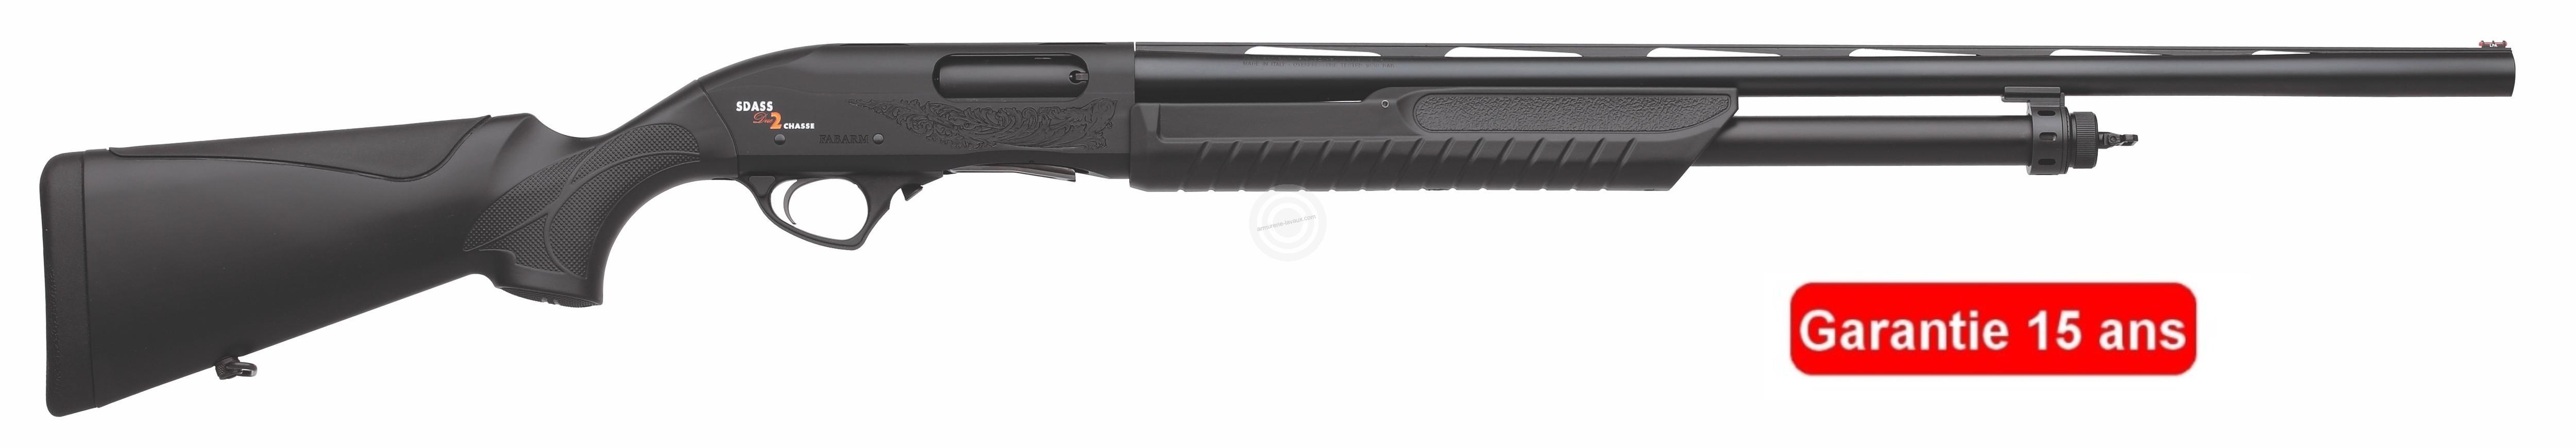 Fusil à pompe FABARM SDASS Compo Chasse cal.12/76 (canon de 66cm)